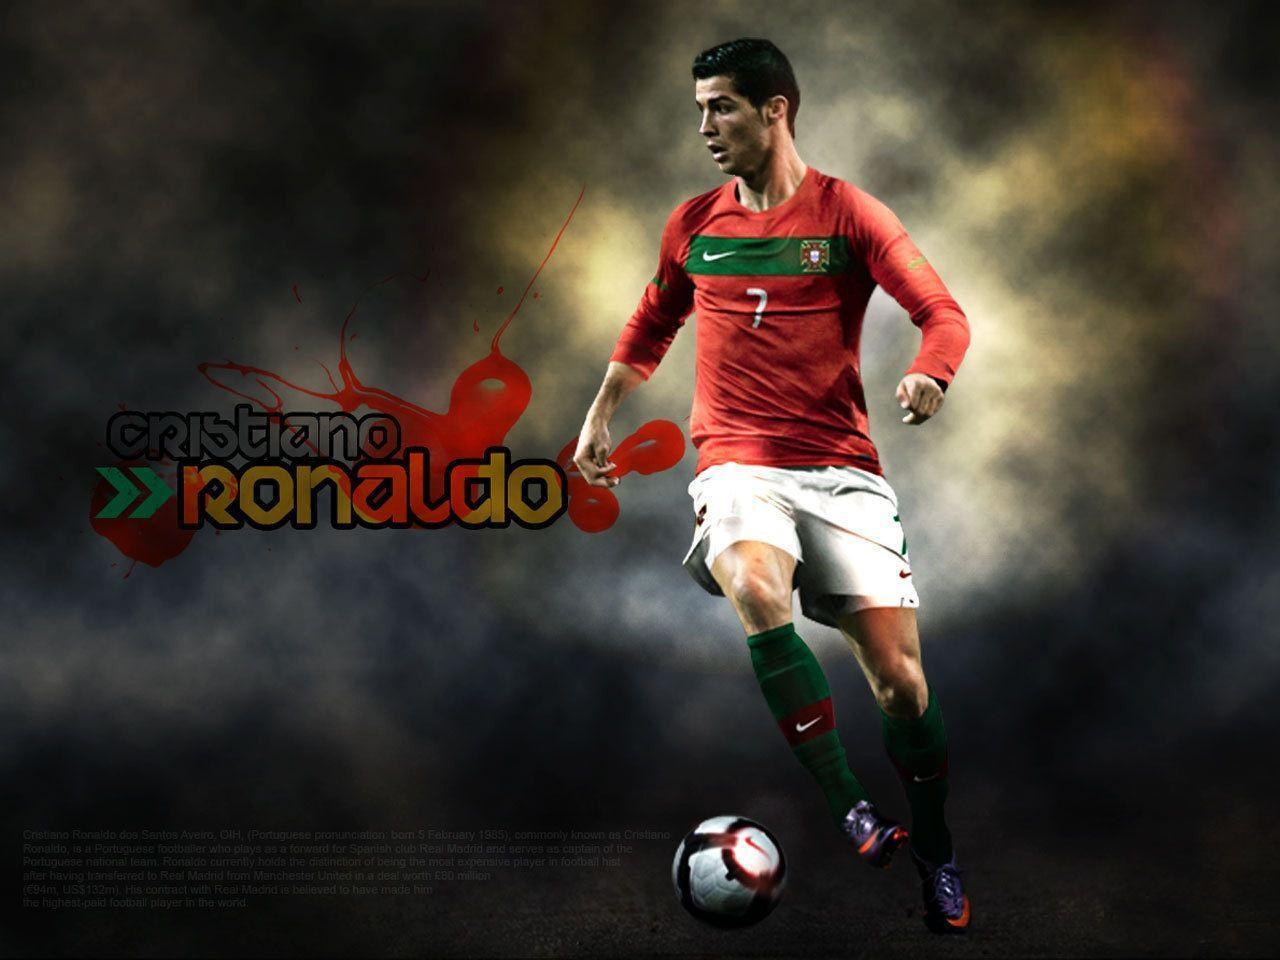 30+ Awesome Cristiano Ronaldo Wallpapers